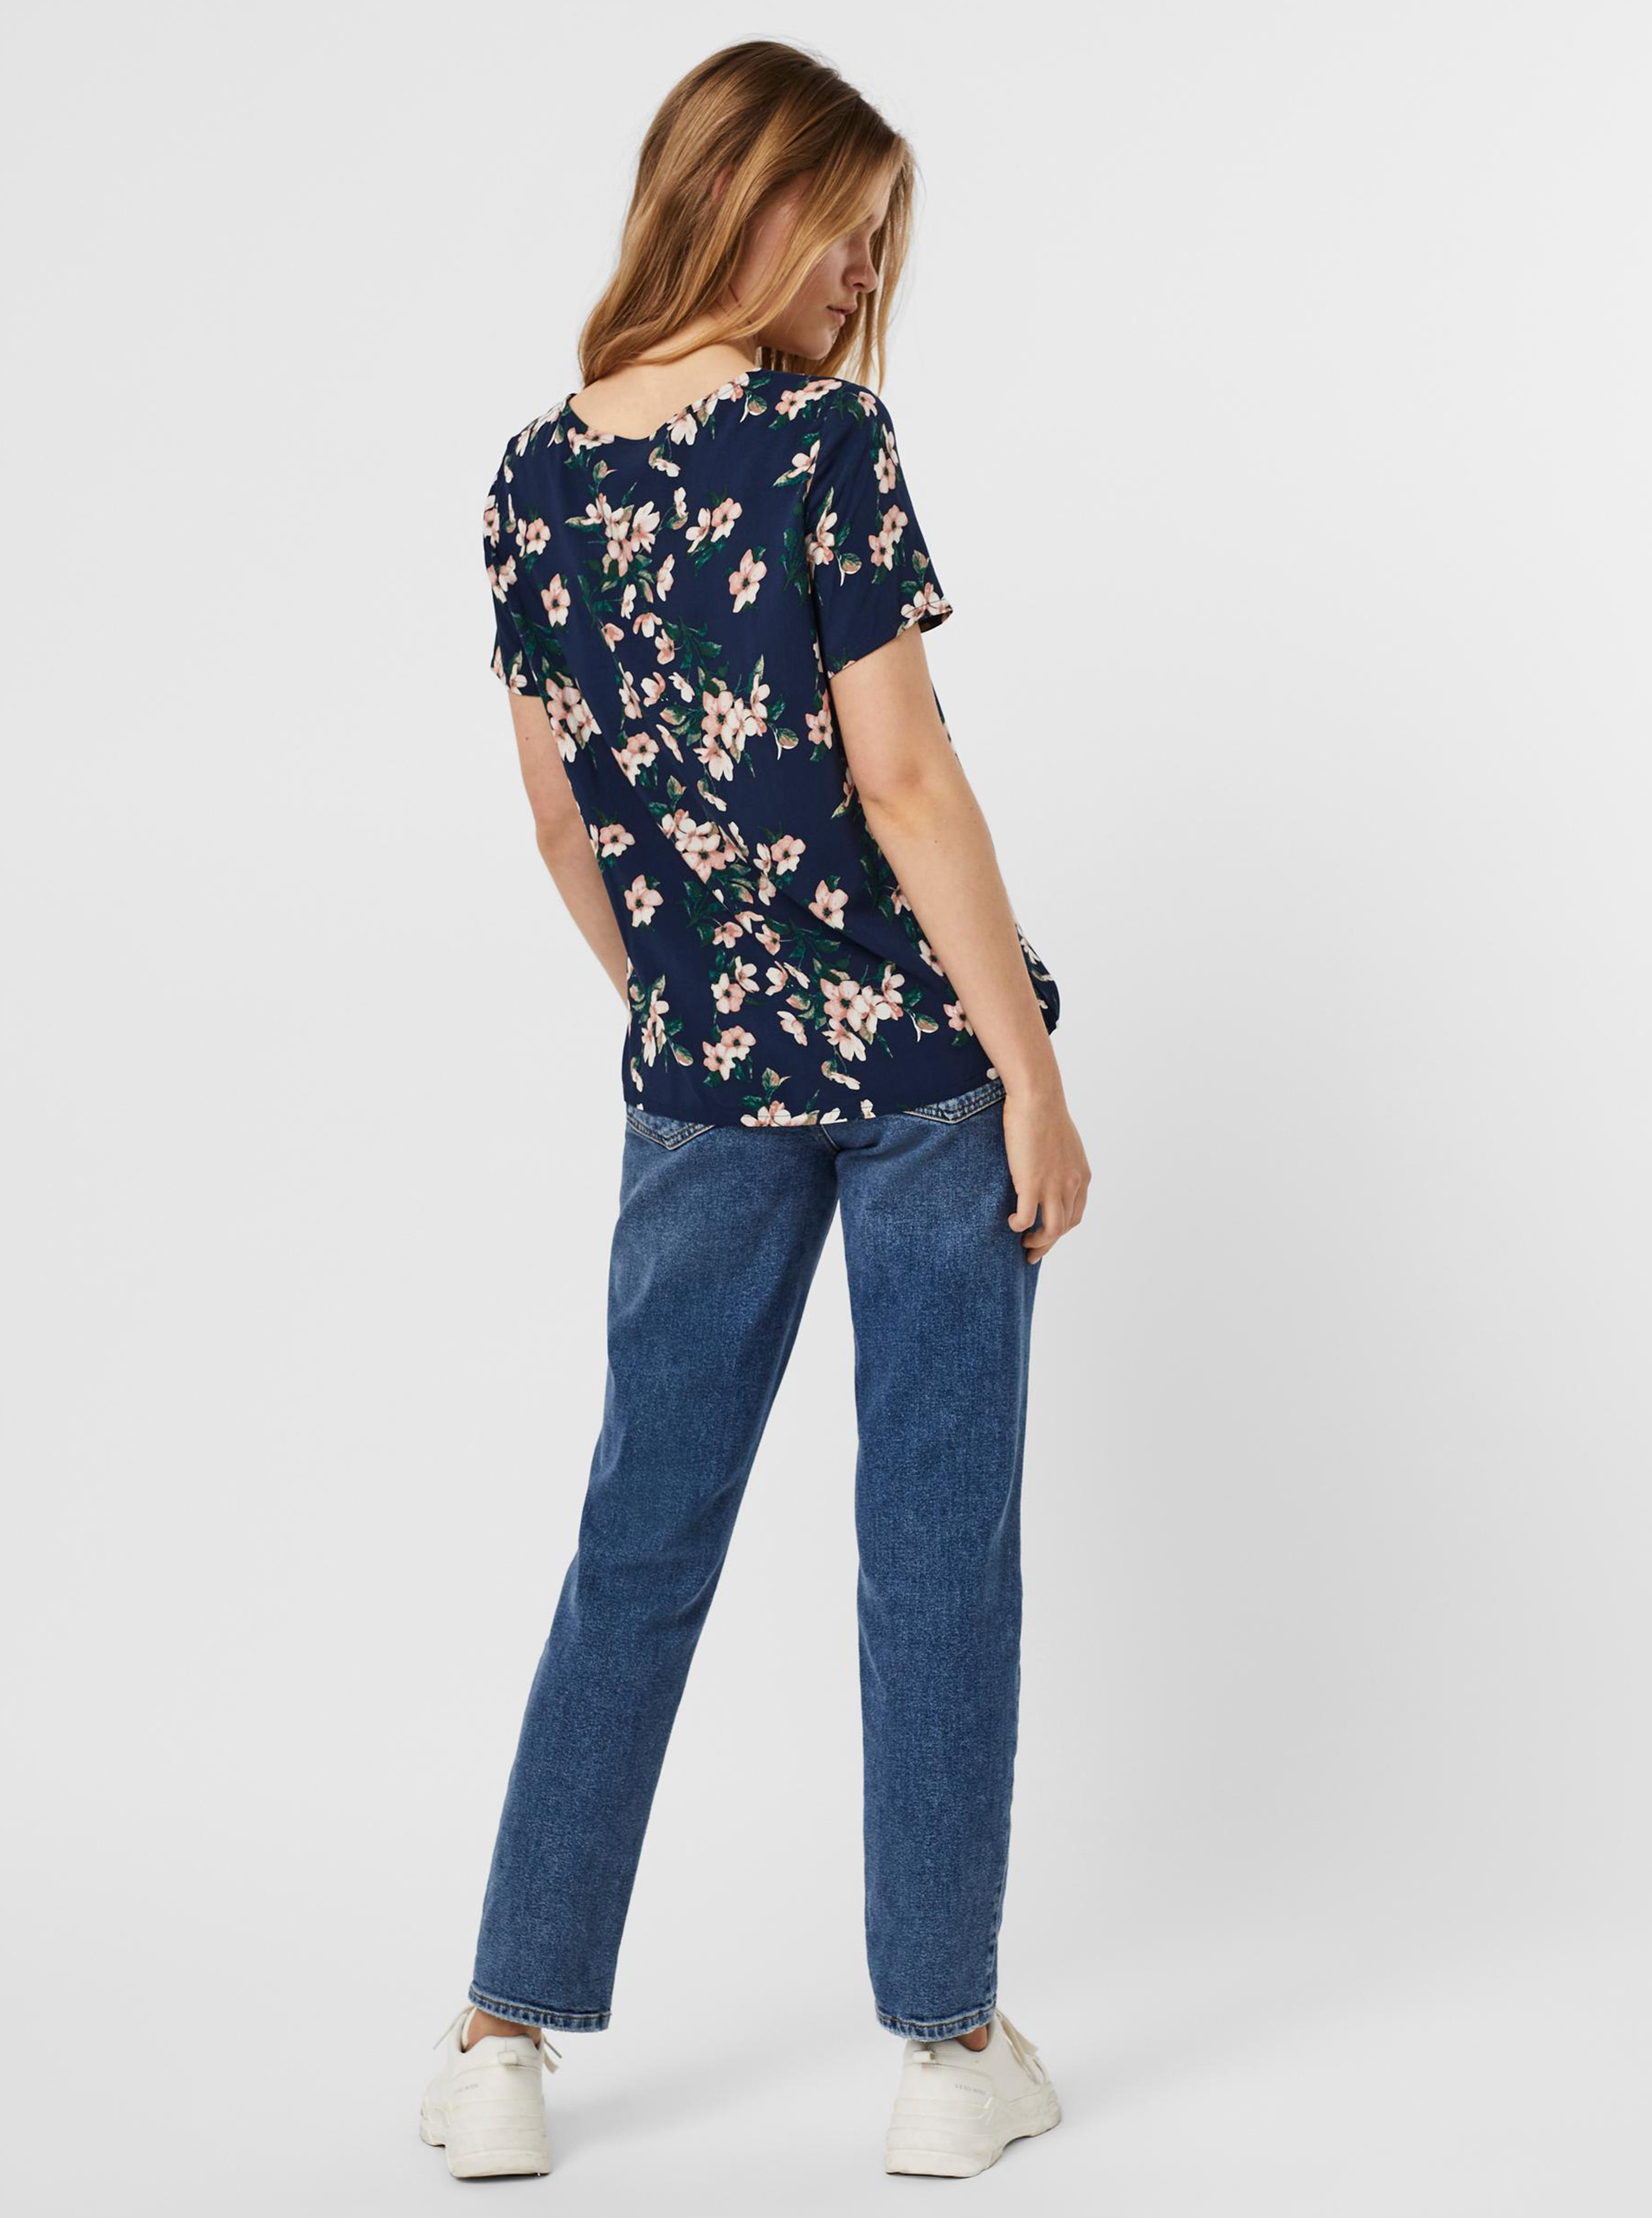 Vero Moda modrá halenka Easy s květinovým motivem